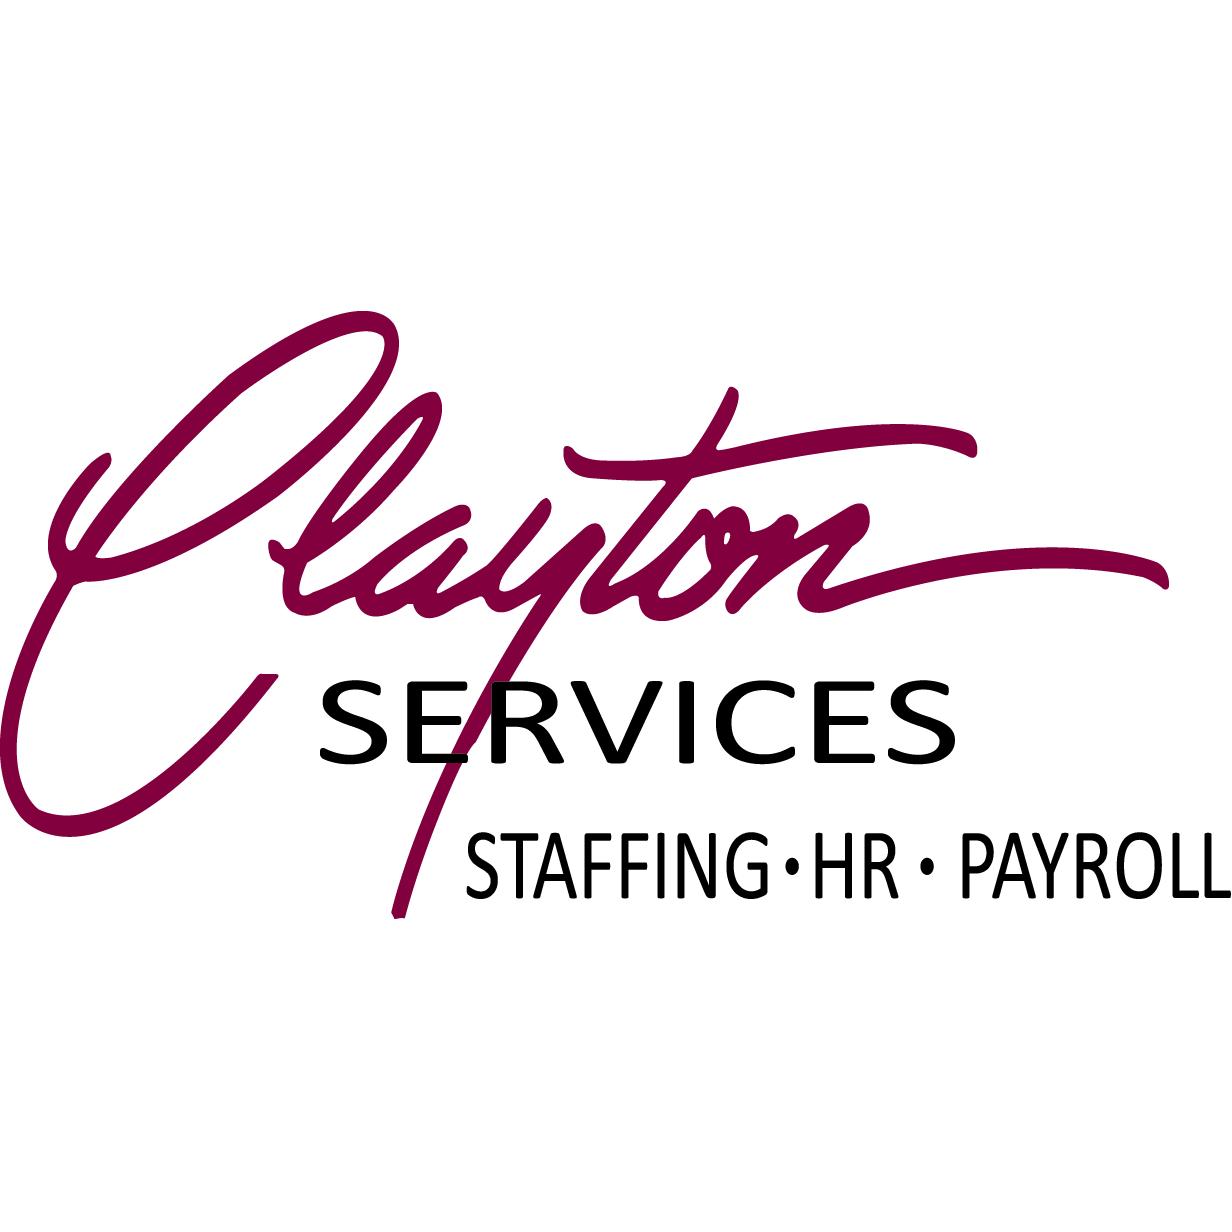 Clayton Services